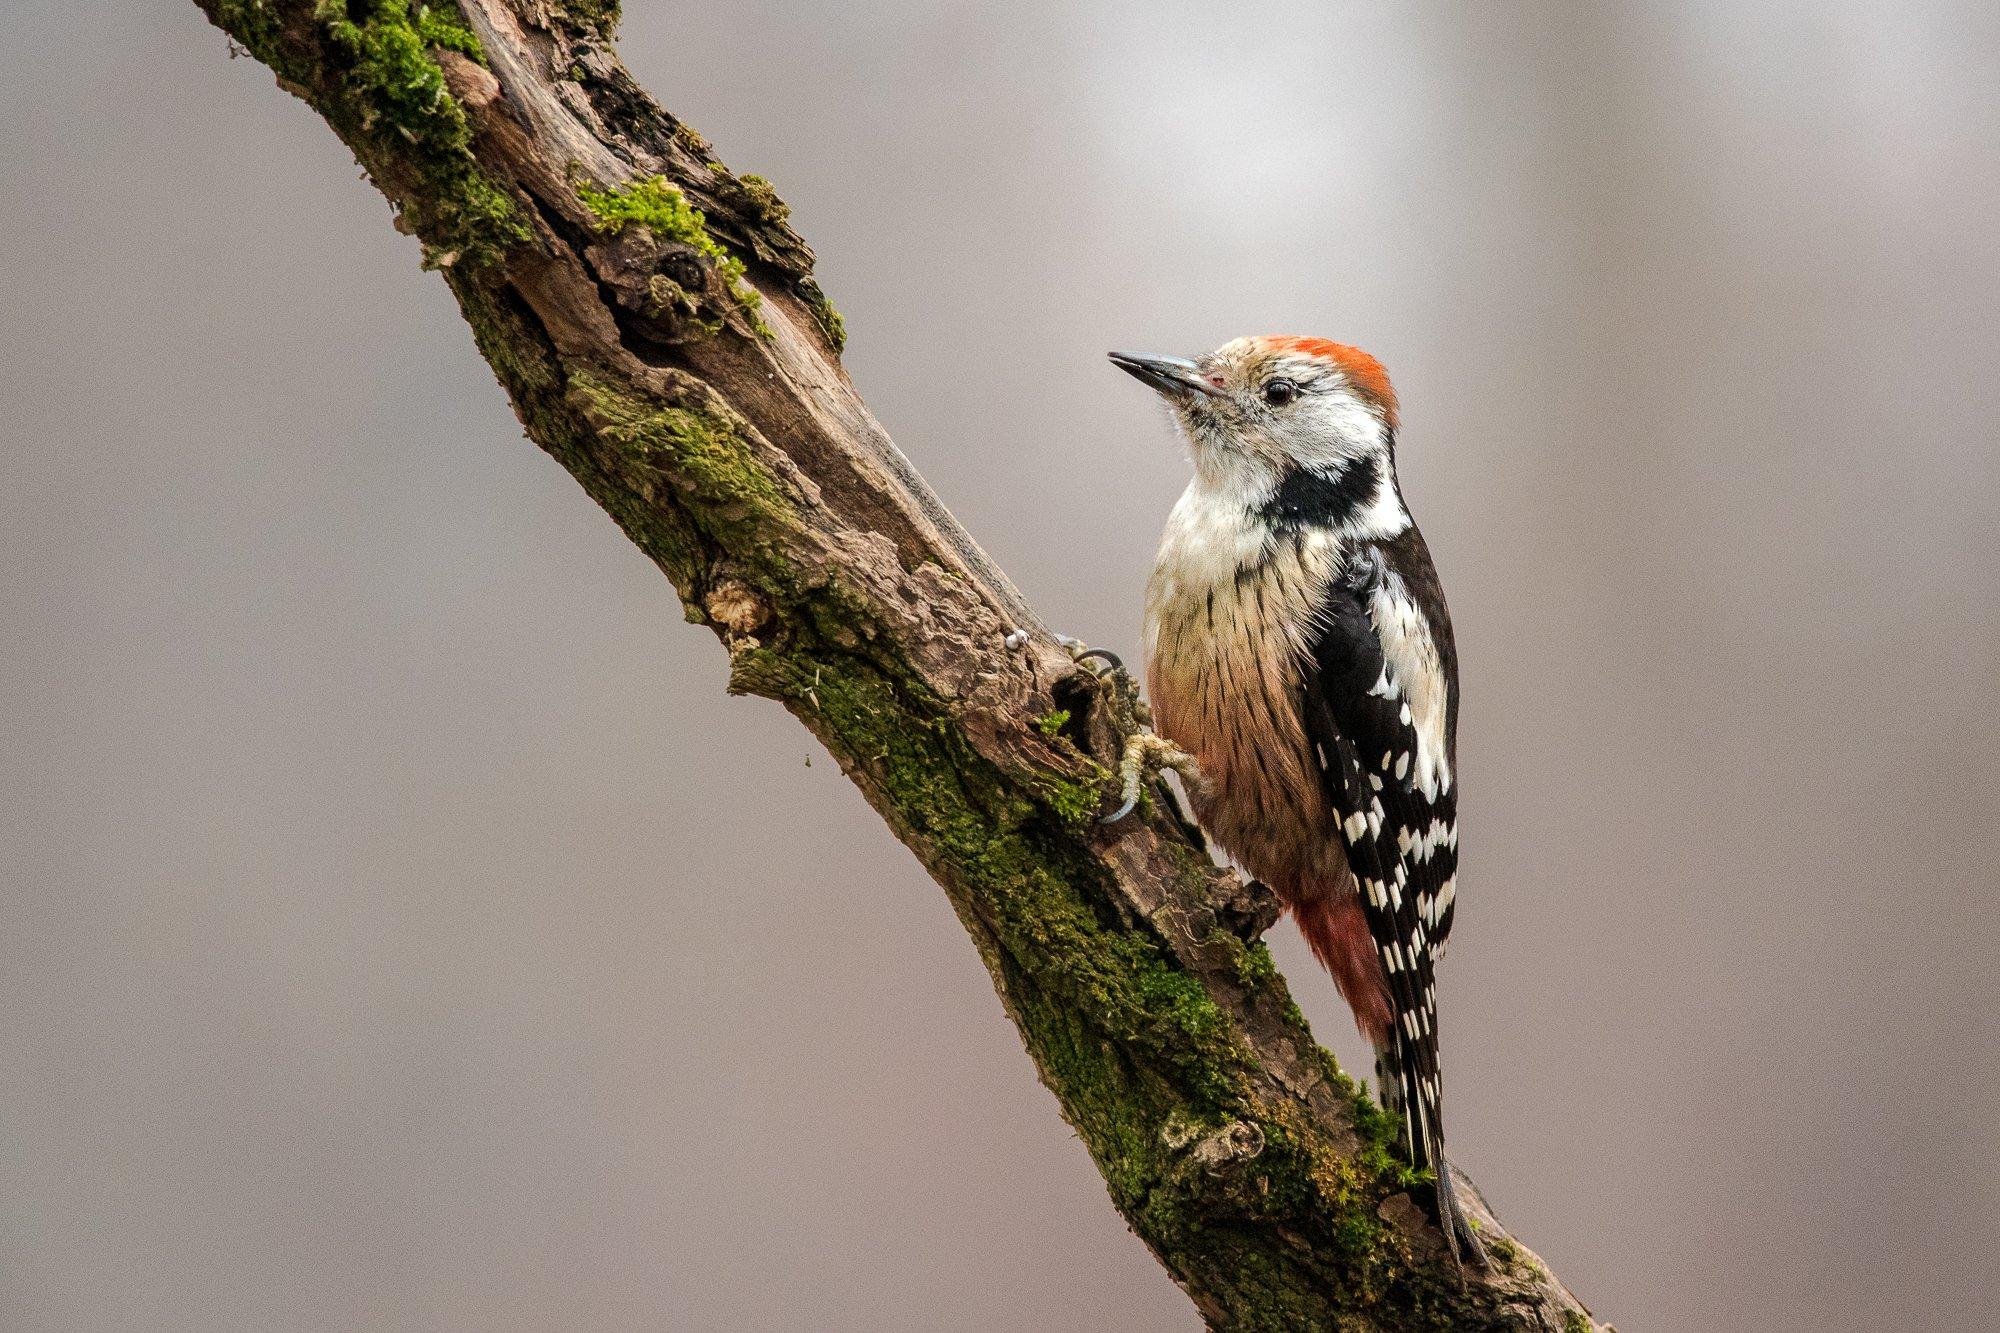 #wood #young # alone # forest, #tree #woodcreeper # background #nature #wild #wildlife, Nikolay Nikolov